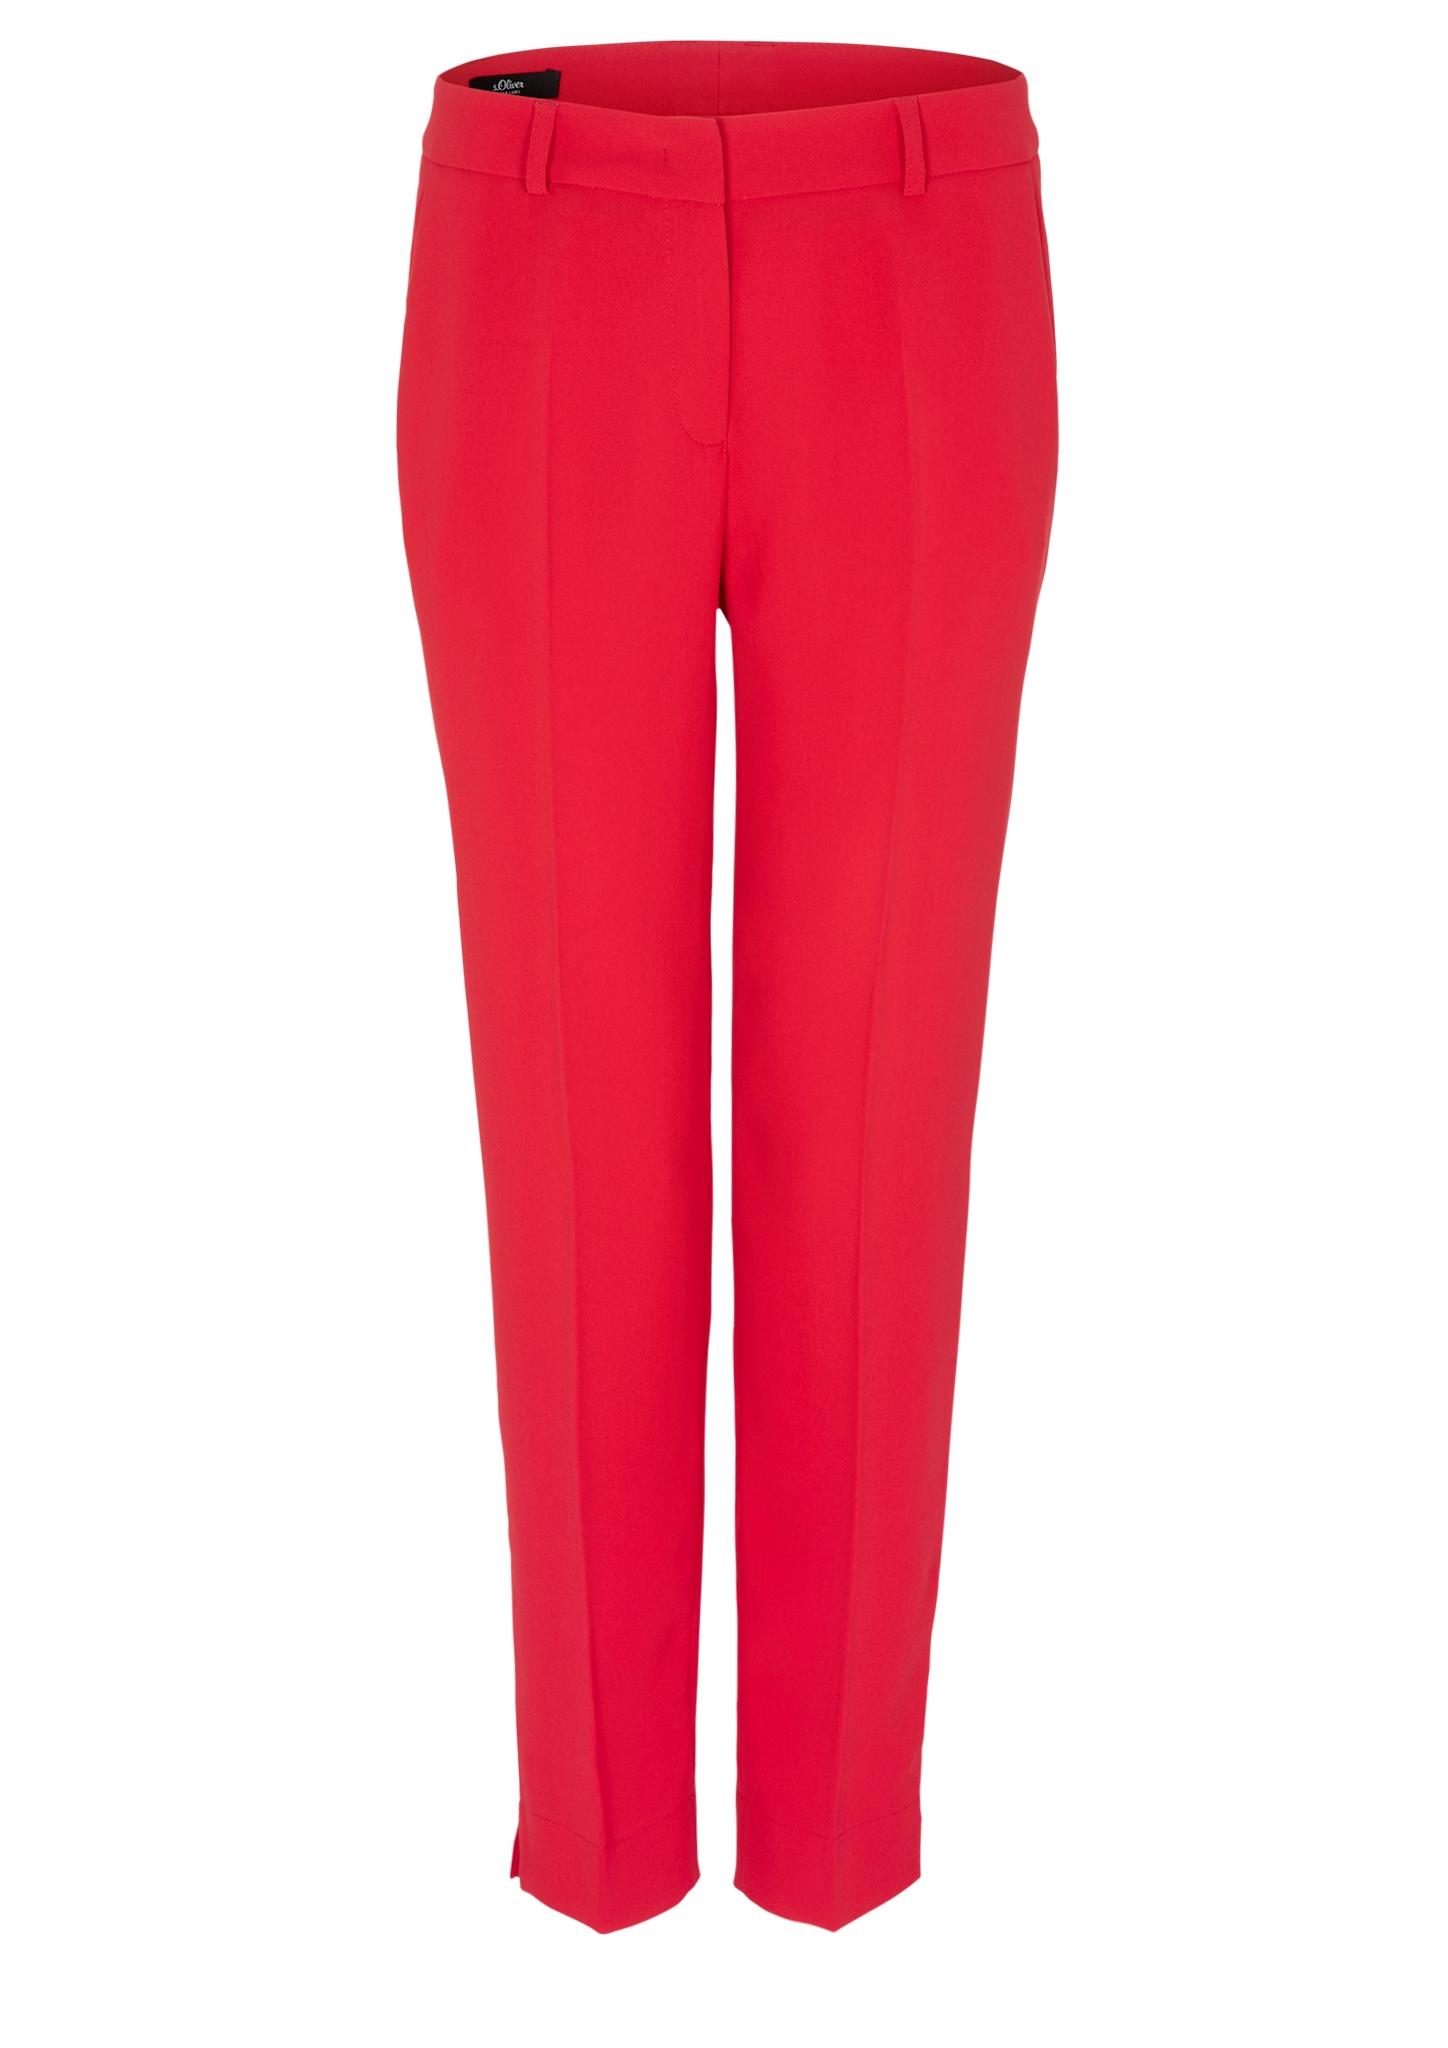 Bügelfaltenhose | Bekleidung > Hosen > Bügelfaltenhosen | Rot | Oberstoff: 100% polyester| futter: 100% acetat | s.Oliver BLACK LABEL